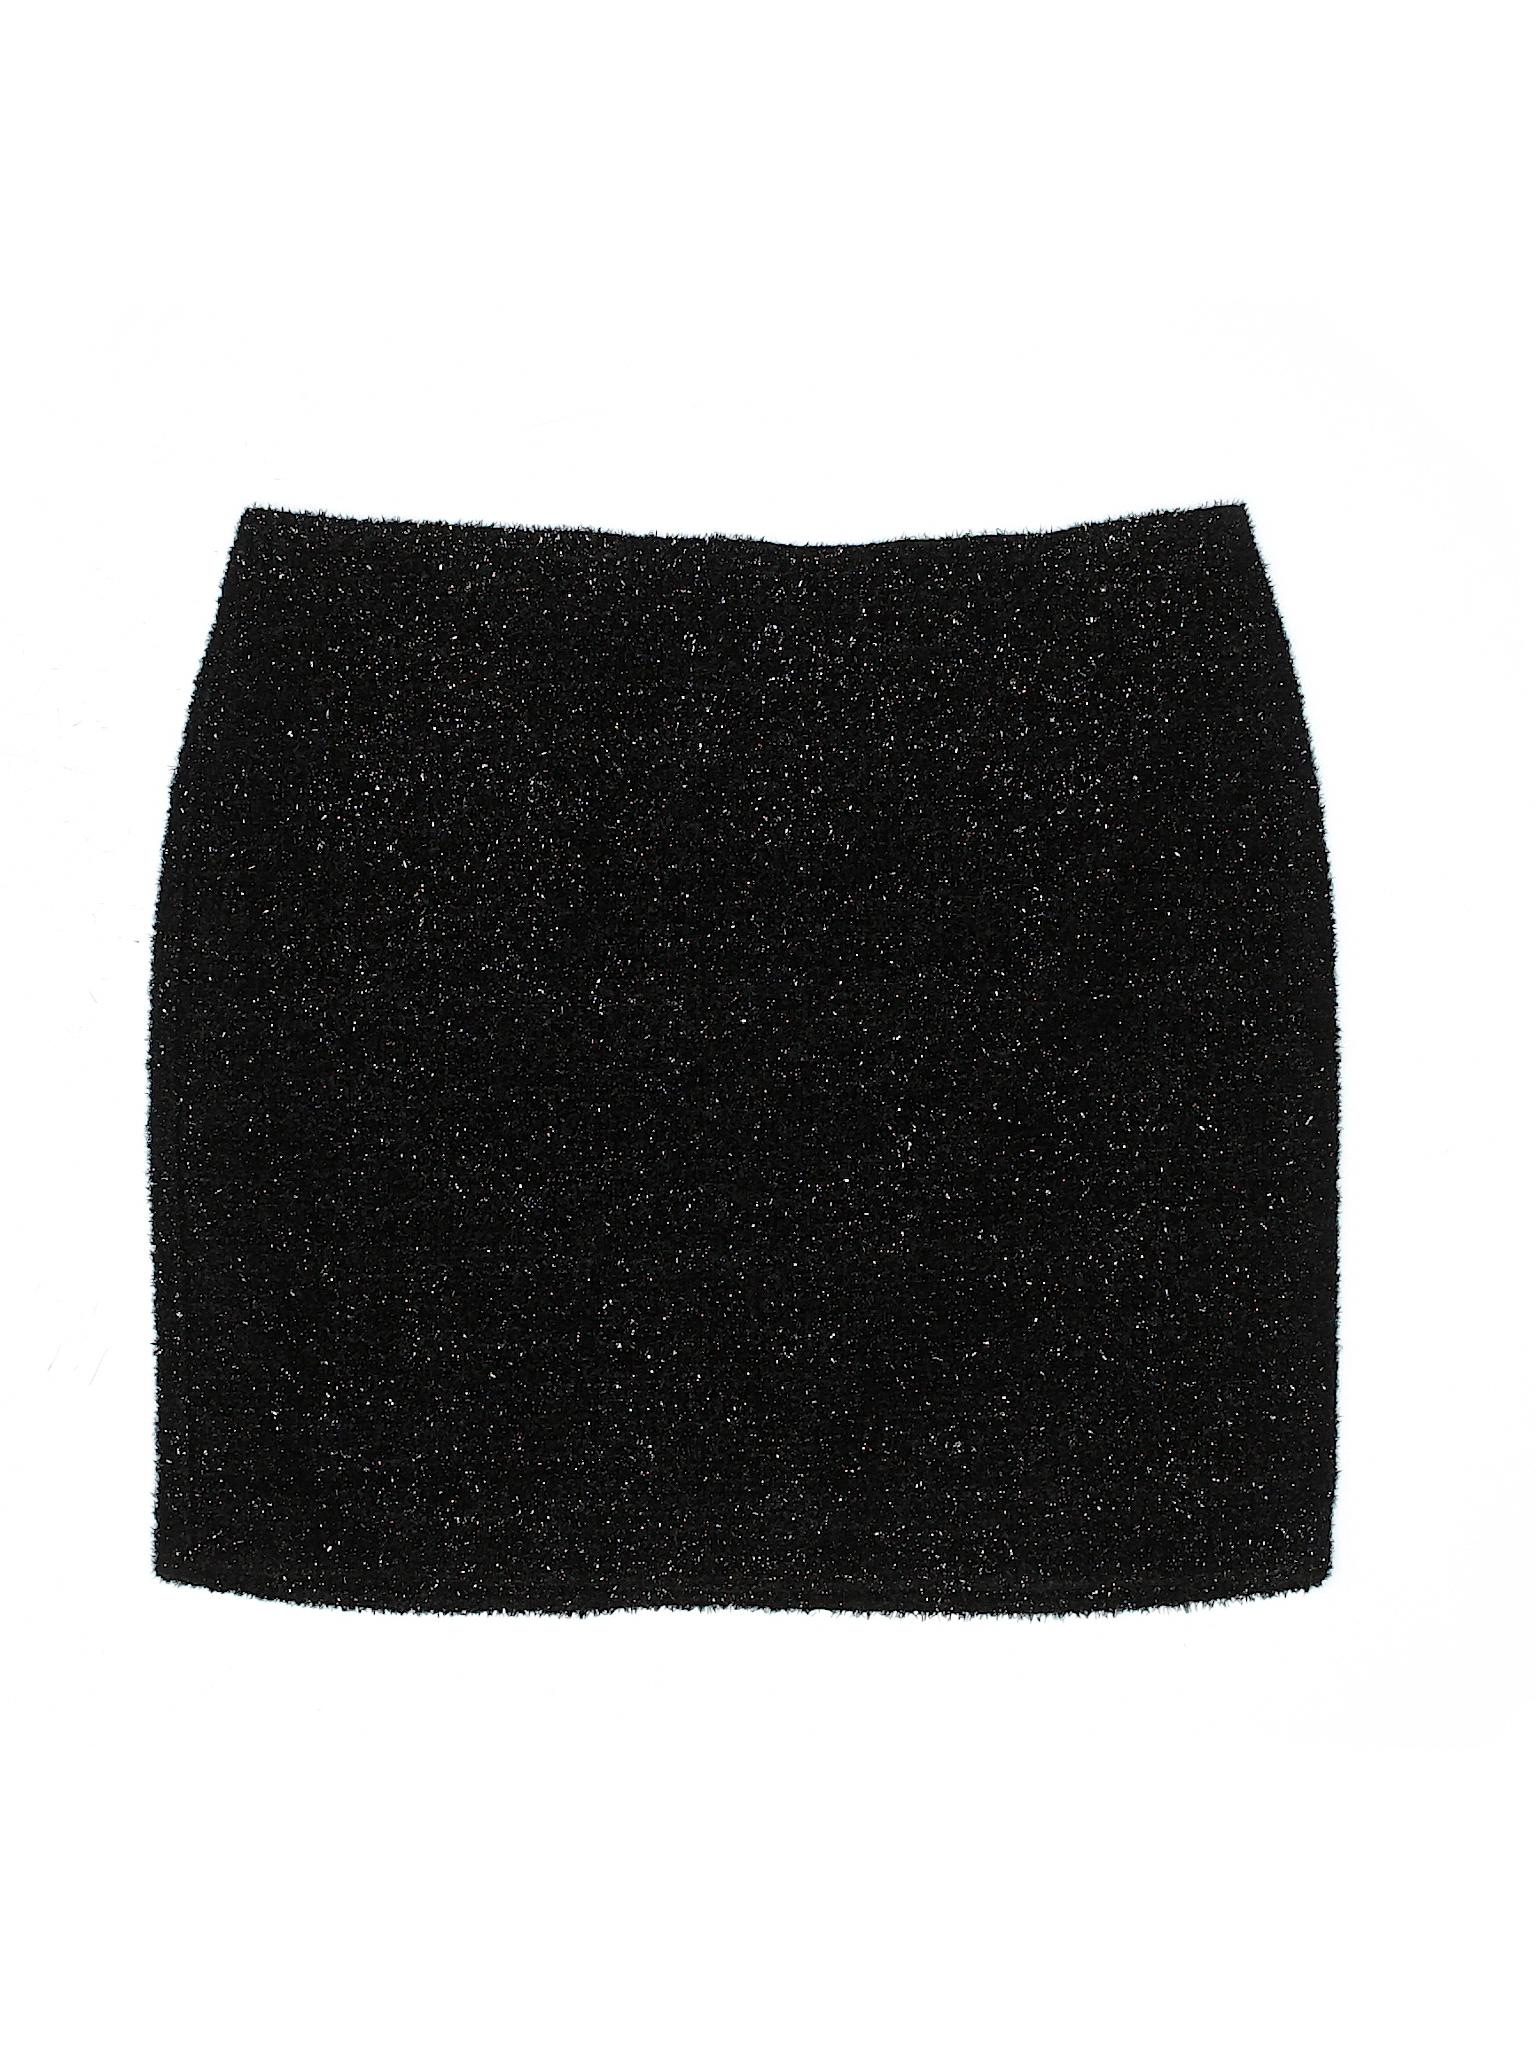 Boutique Formal Boutique Skirt Boutique Formal Skirt Formal 1q8dESw